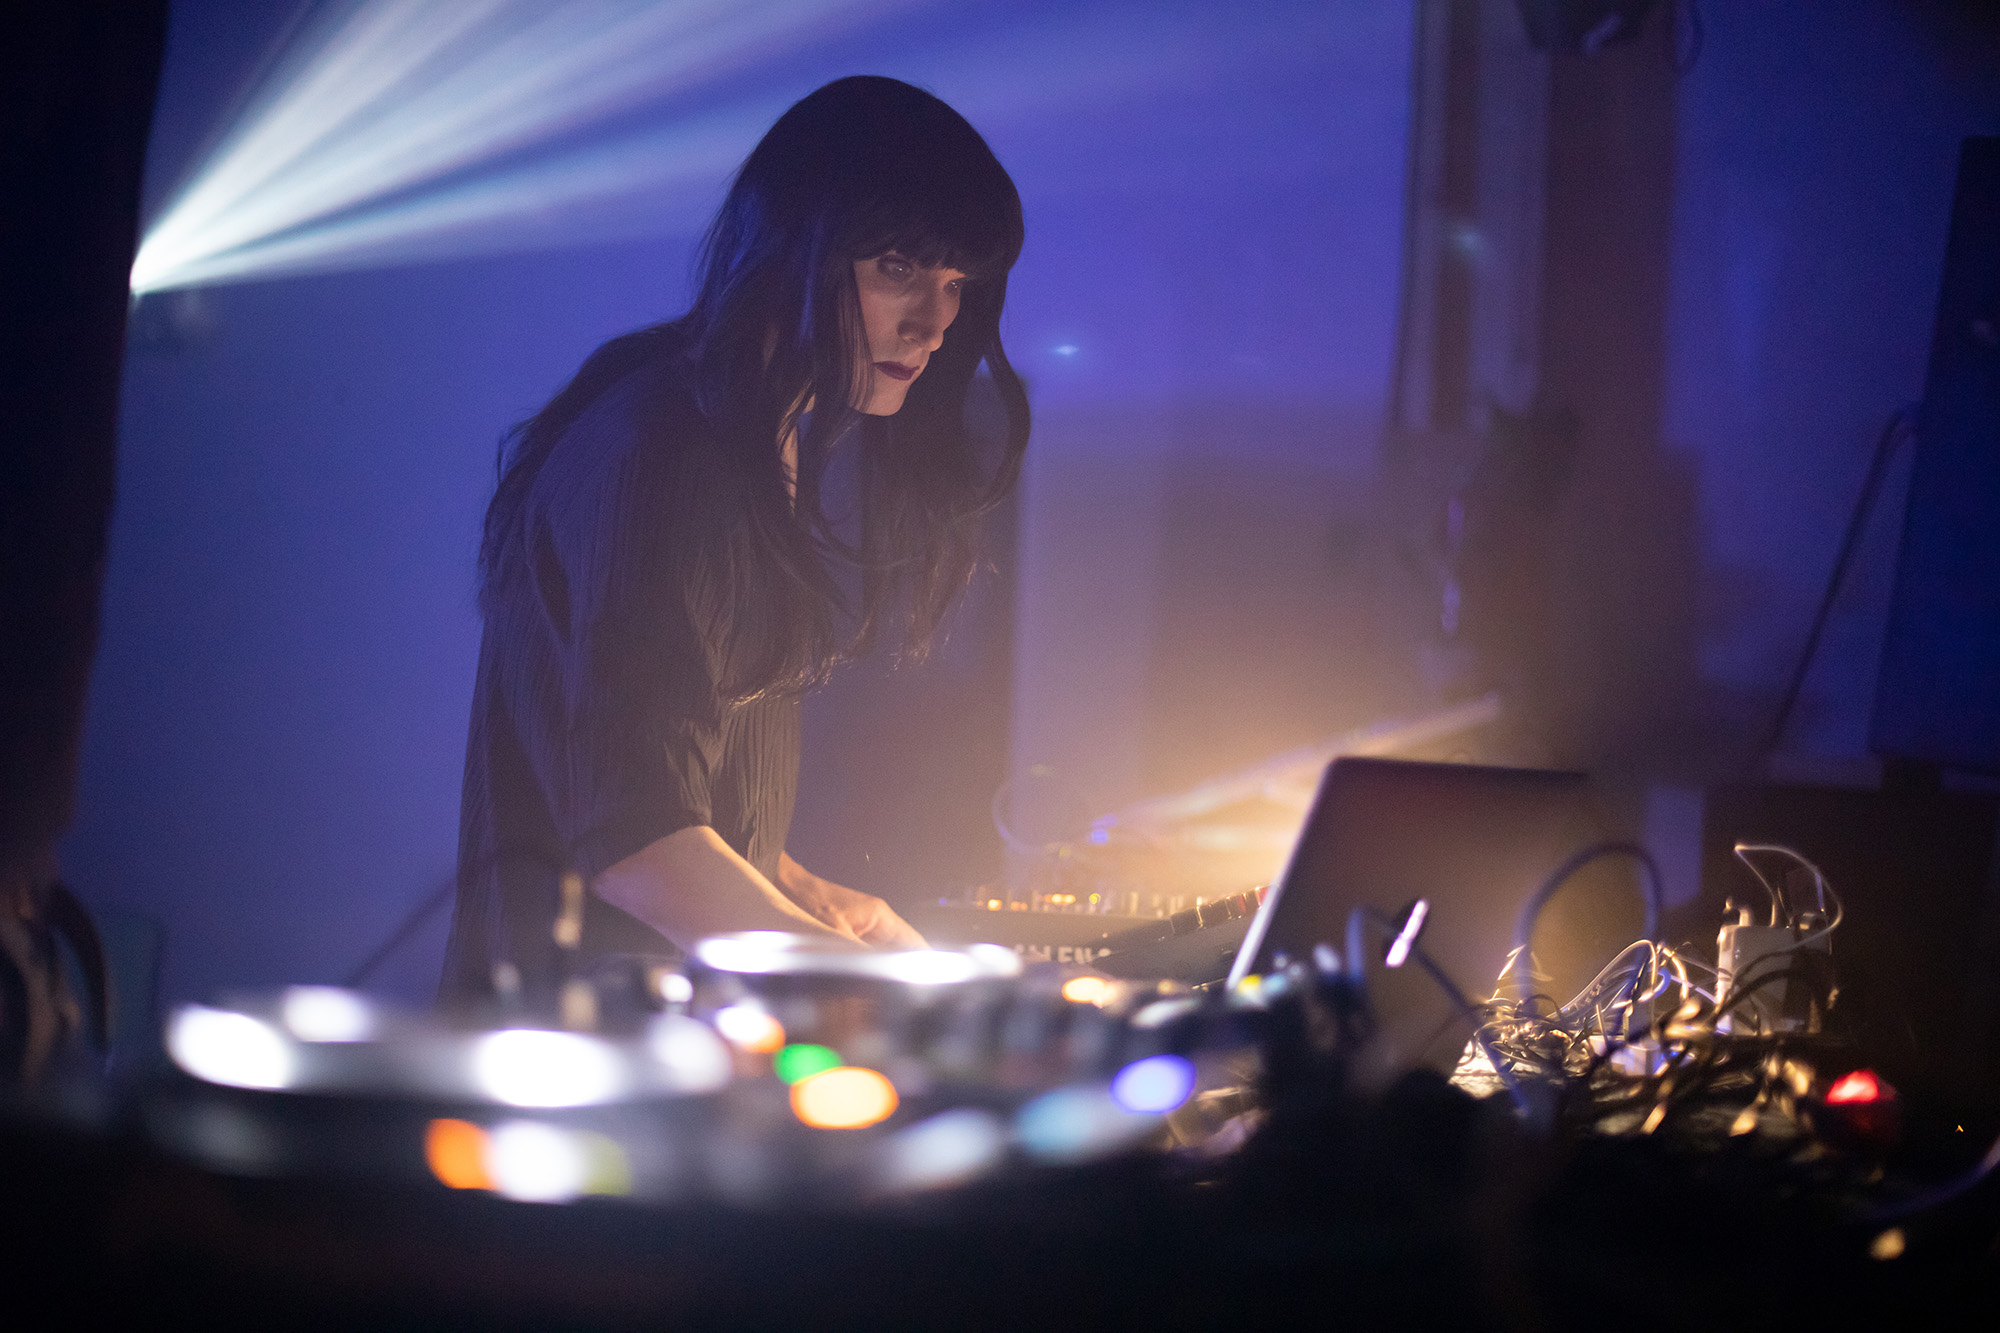 Tæchno Live: Rrose (US) - 08/03/2019